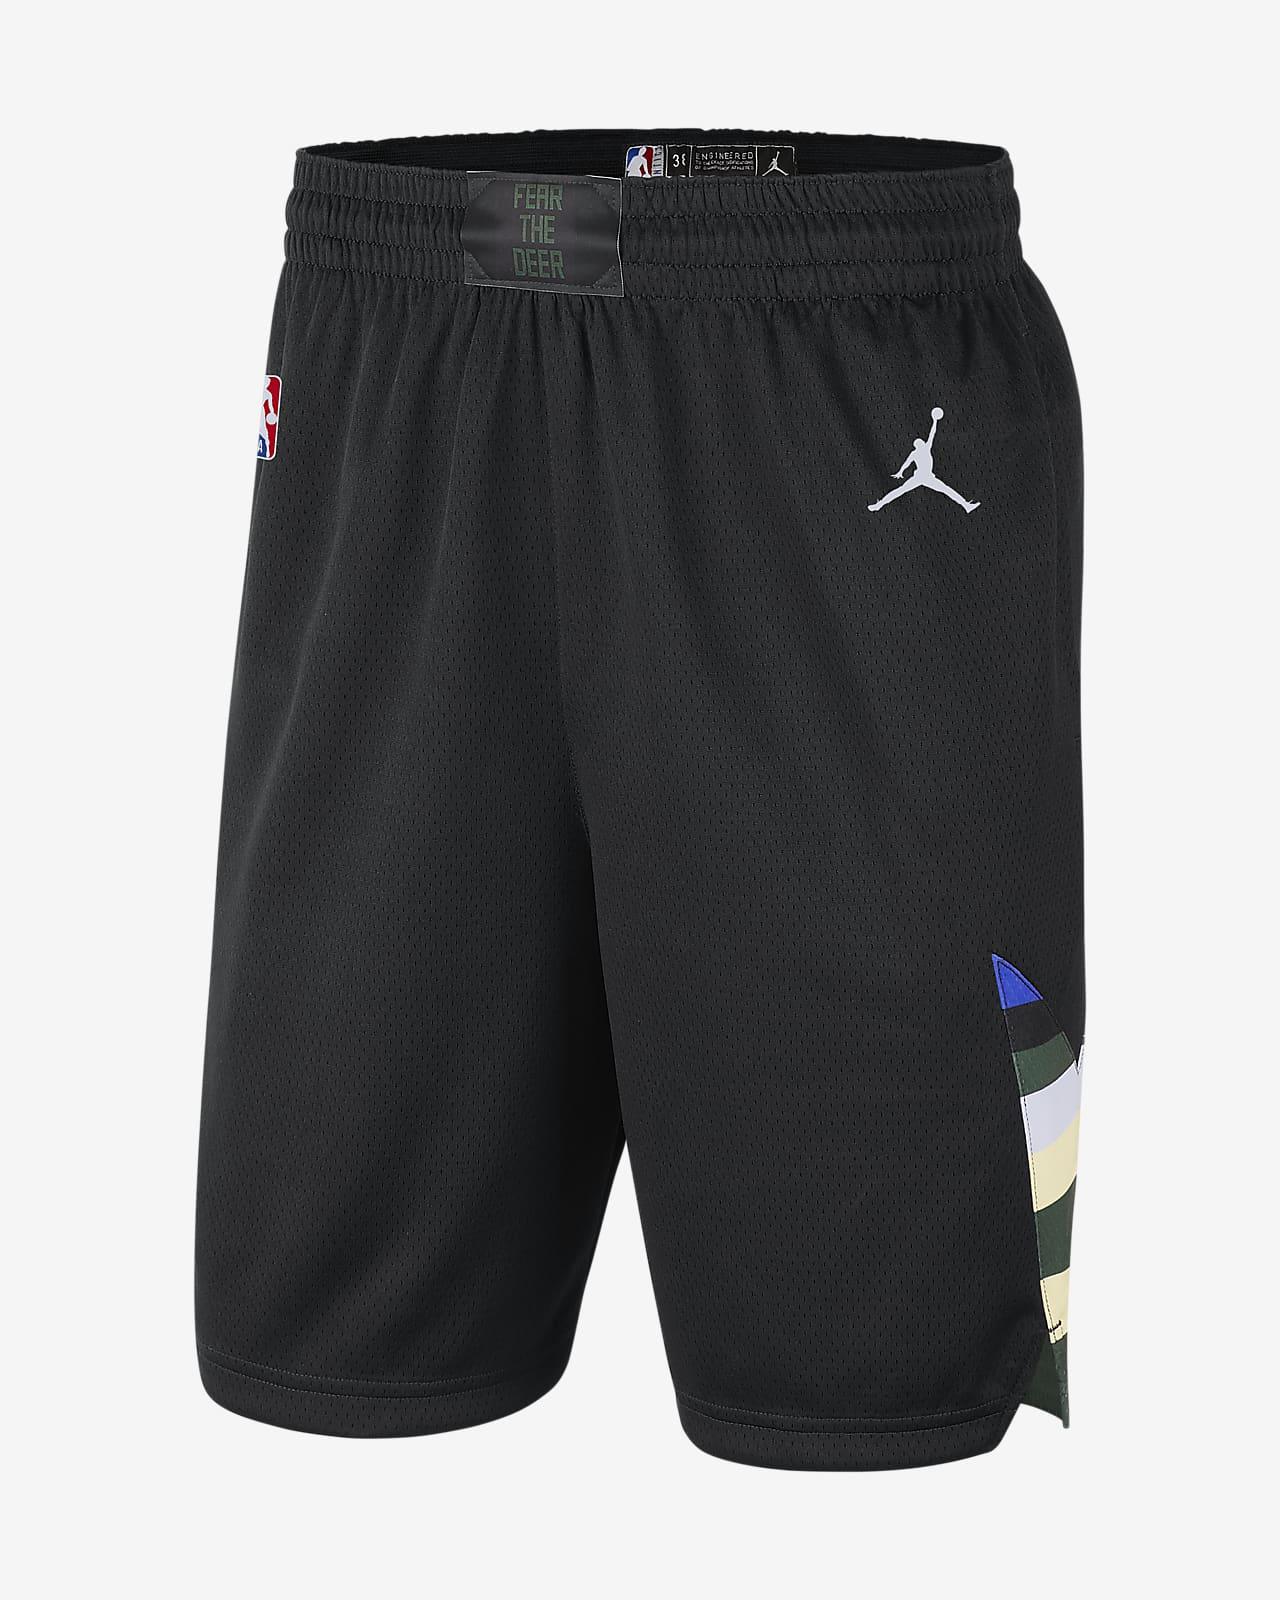 Short Jordan NBA Swingman Bucks Statement Edition 2020 pour Homme